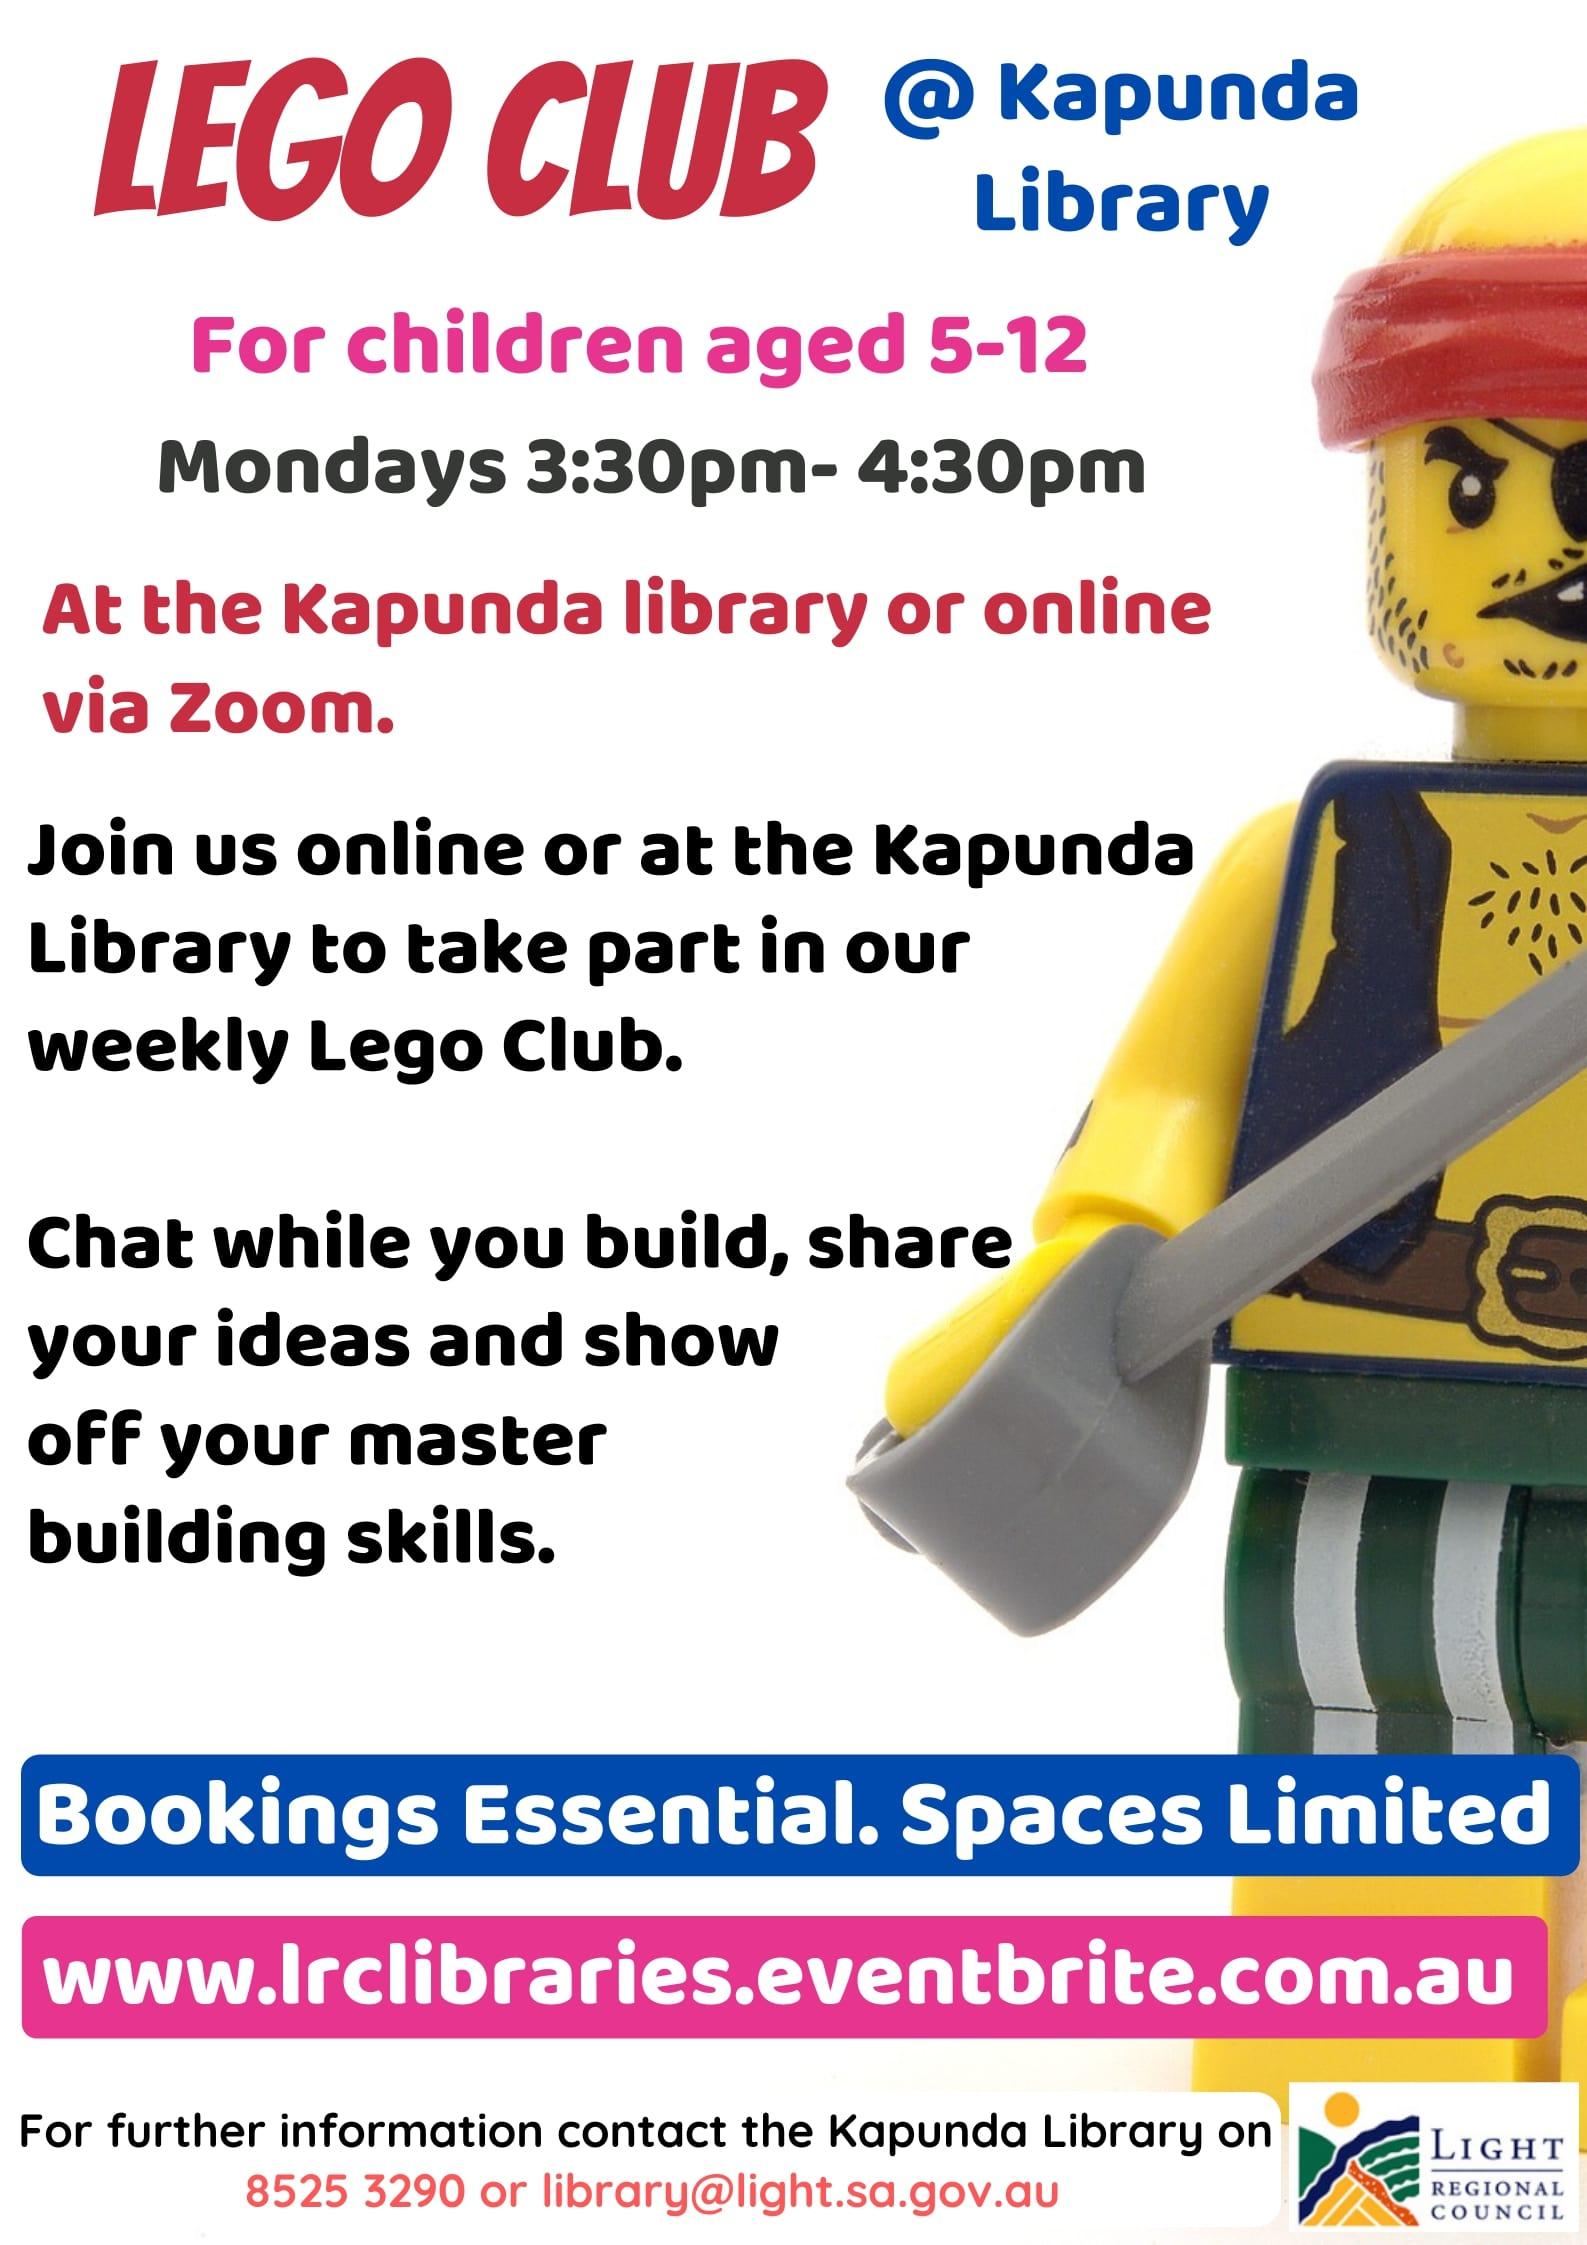 Term 3 2020 Lego @ Kapunda